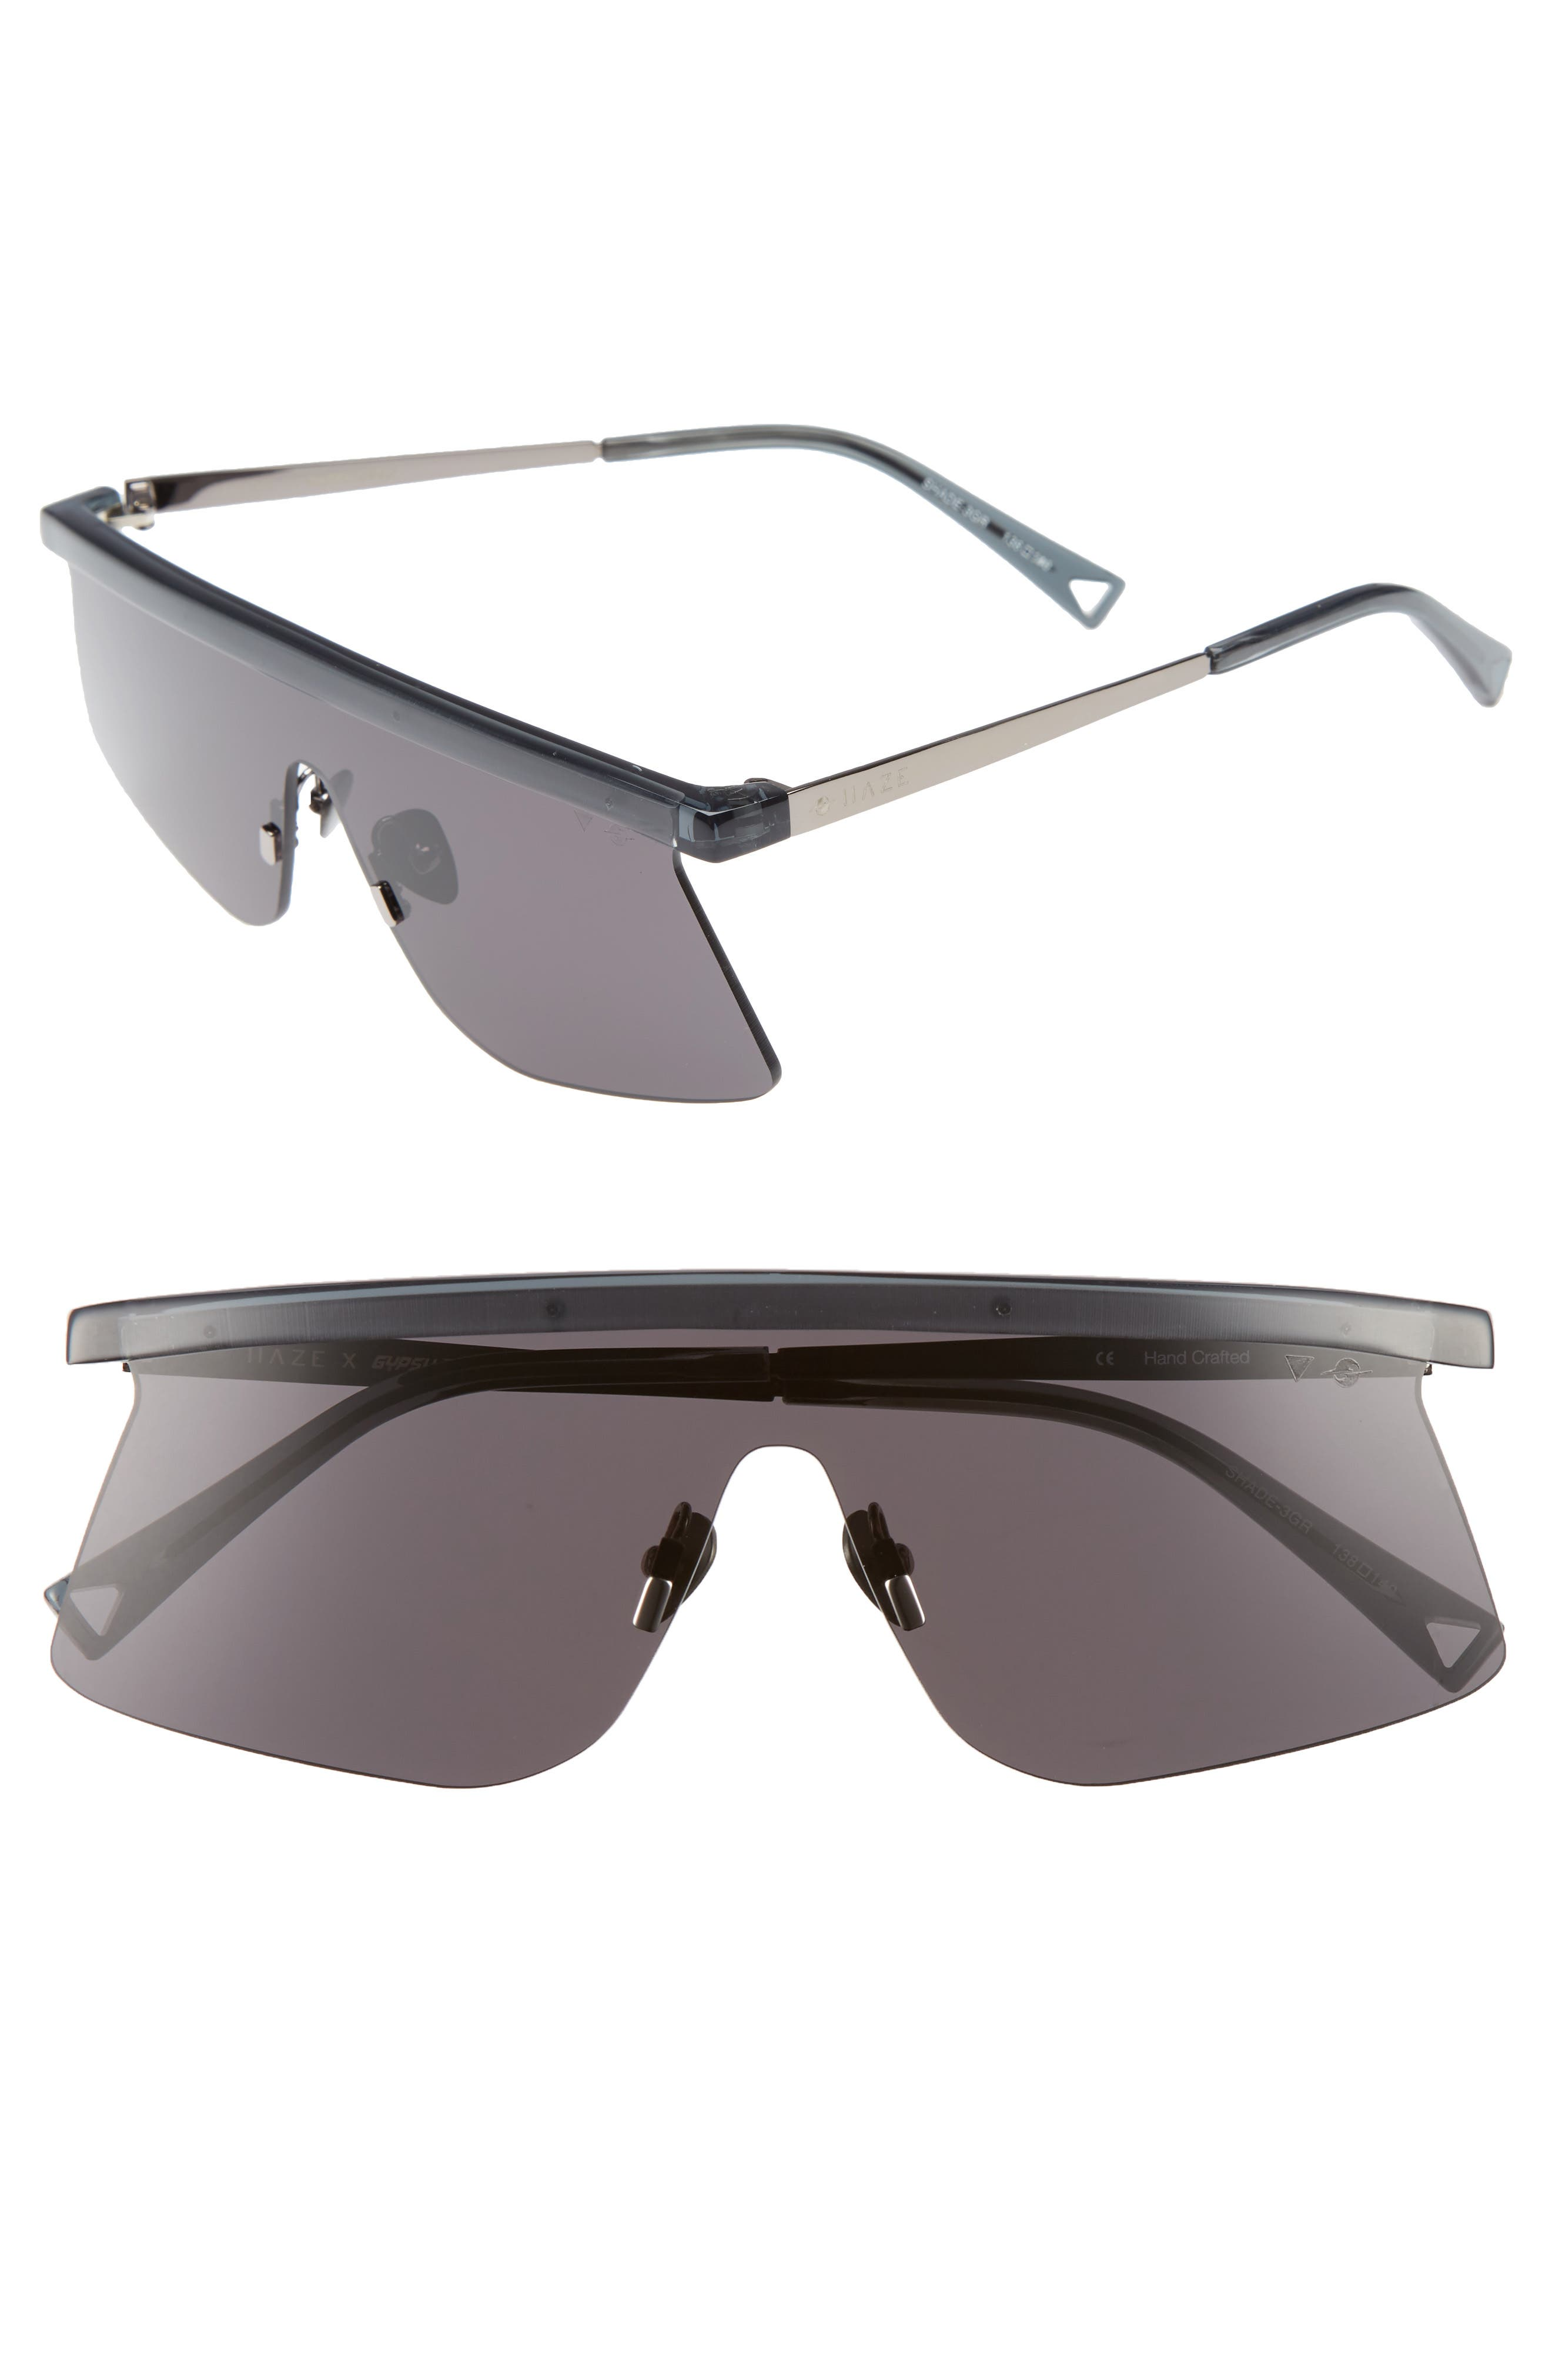 Main Image - HAZE Shade Shield Sunglasses